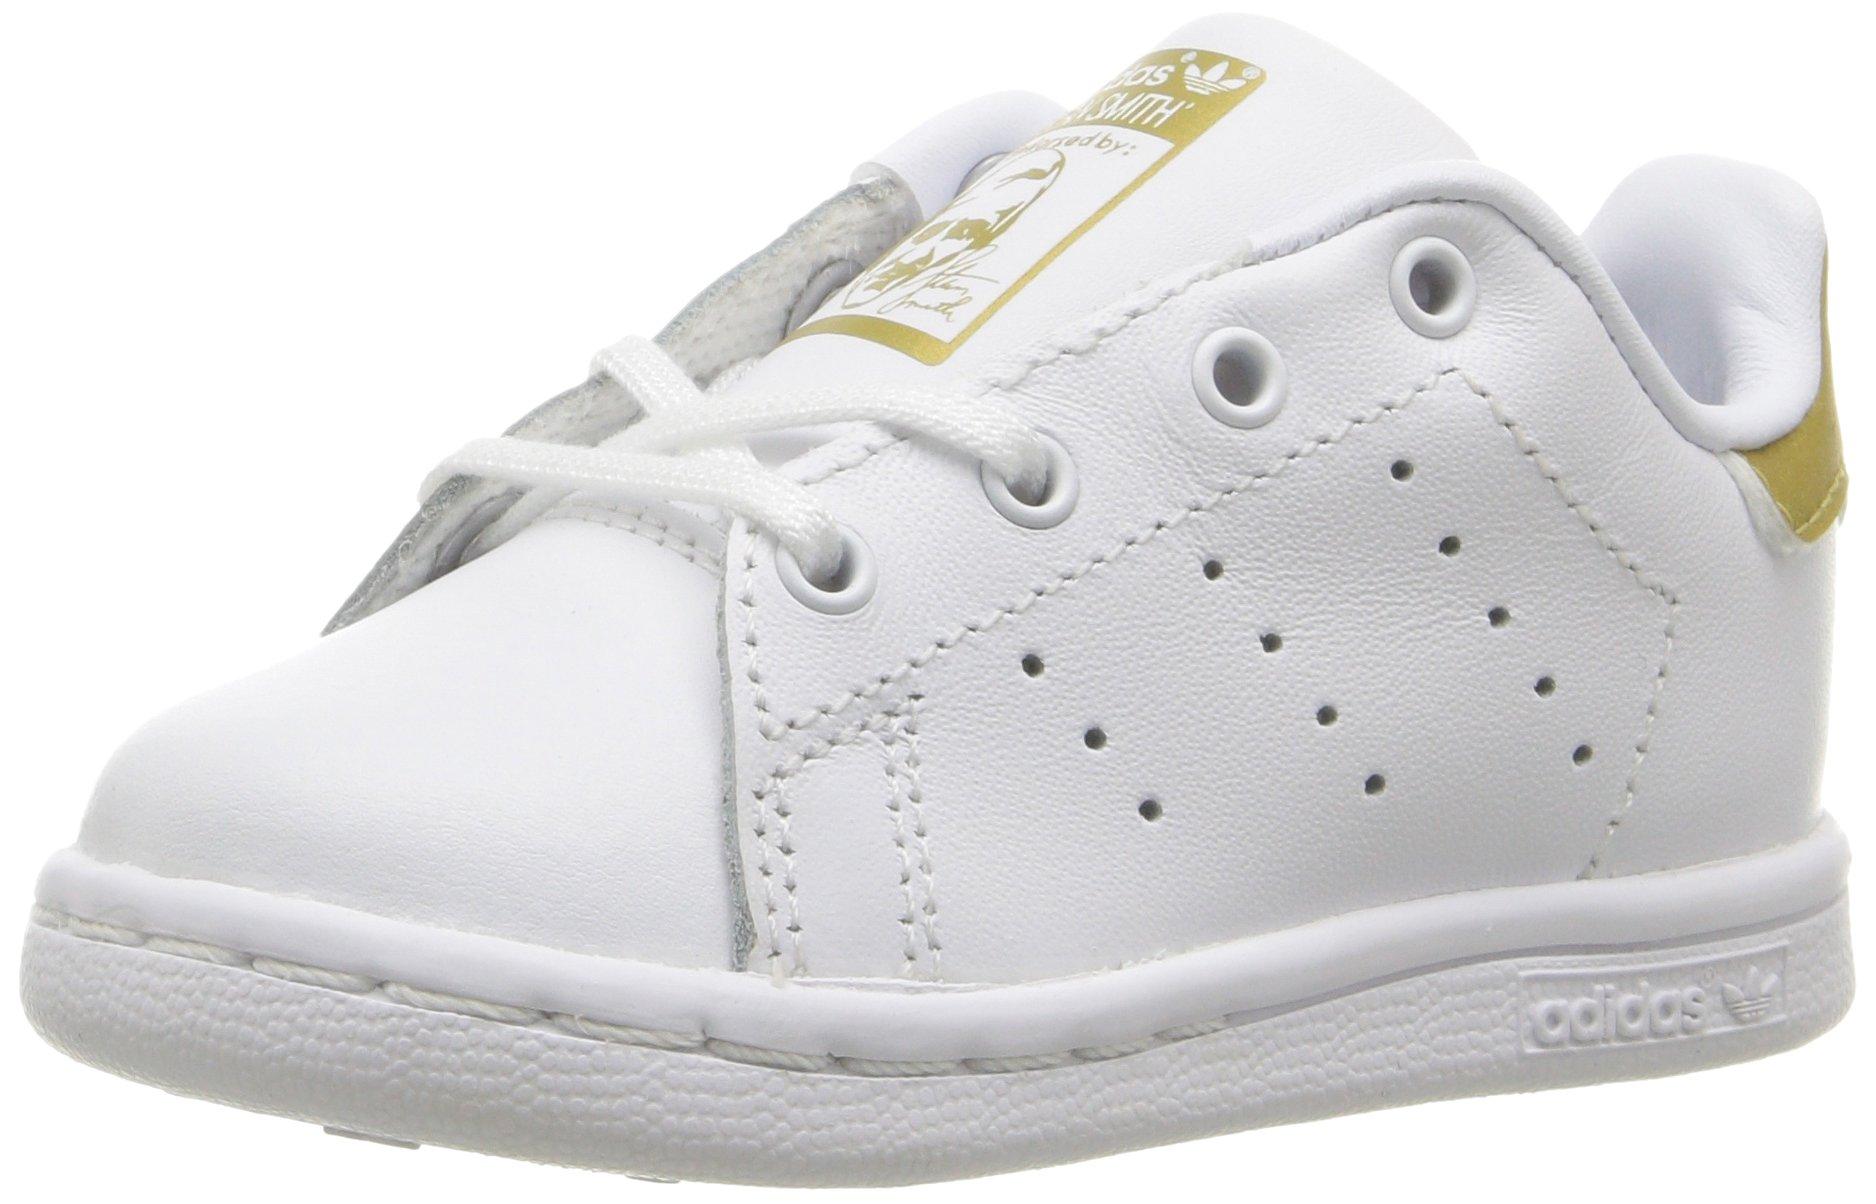 online store f510f 5827b adidas Originals Baby Stan Smith Sneaker, Footwear White Gold Metallic, 7K